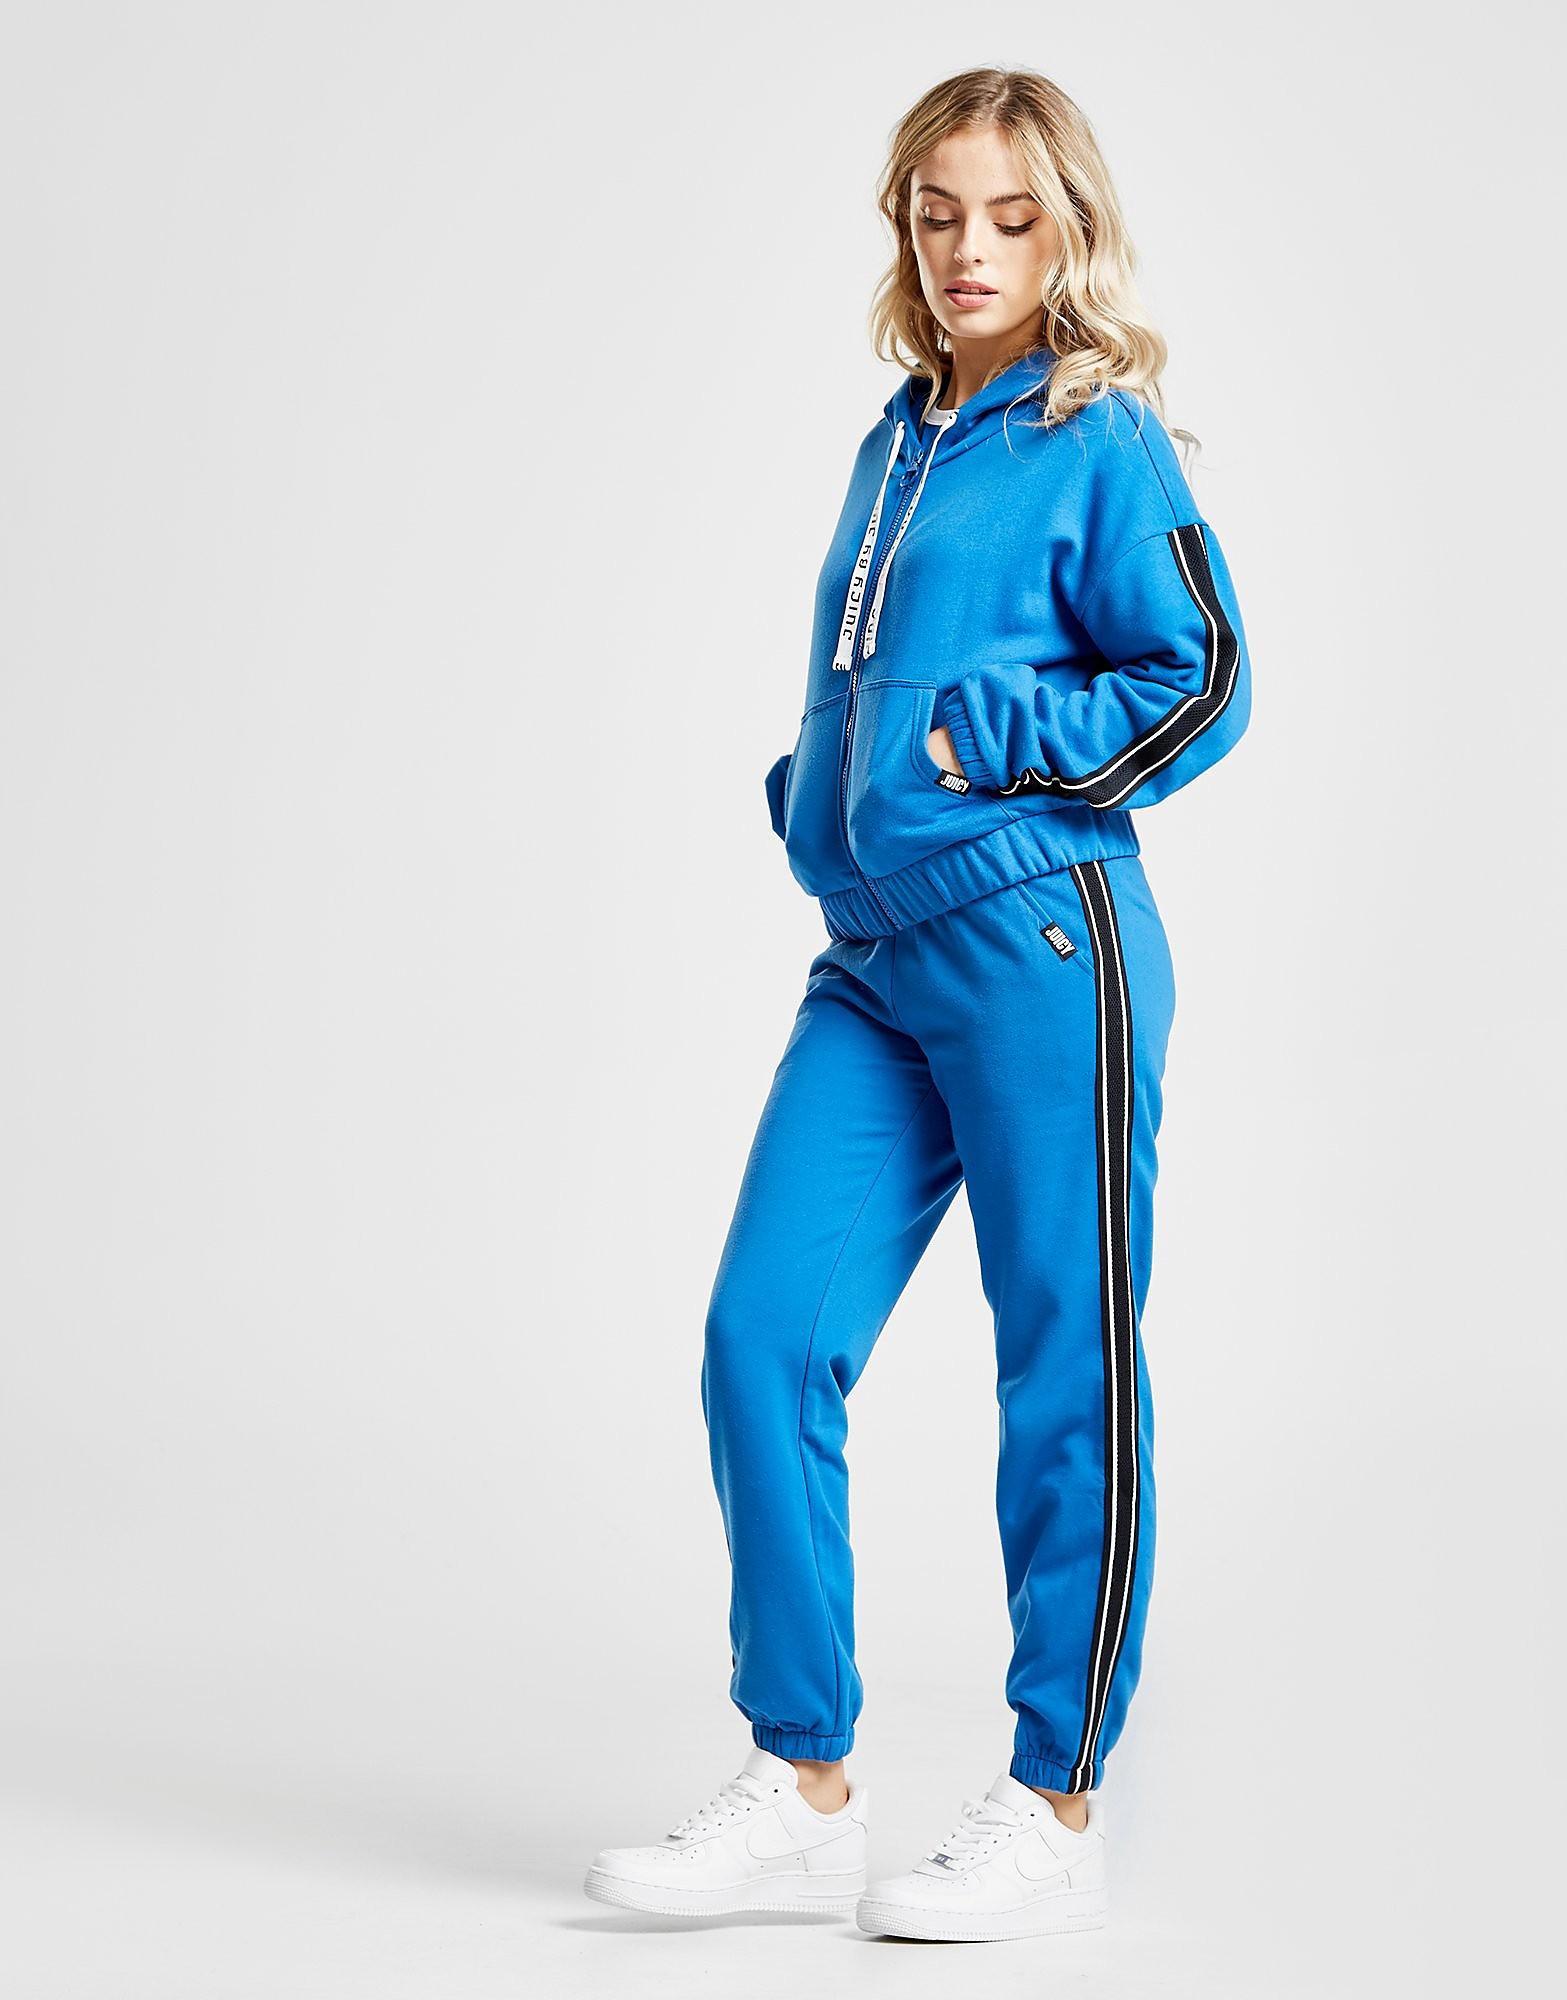 Juicy by Juicy Couture Mesh Stripe Track Pants Dames - Blauw - Dames